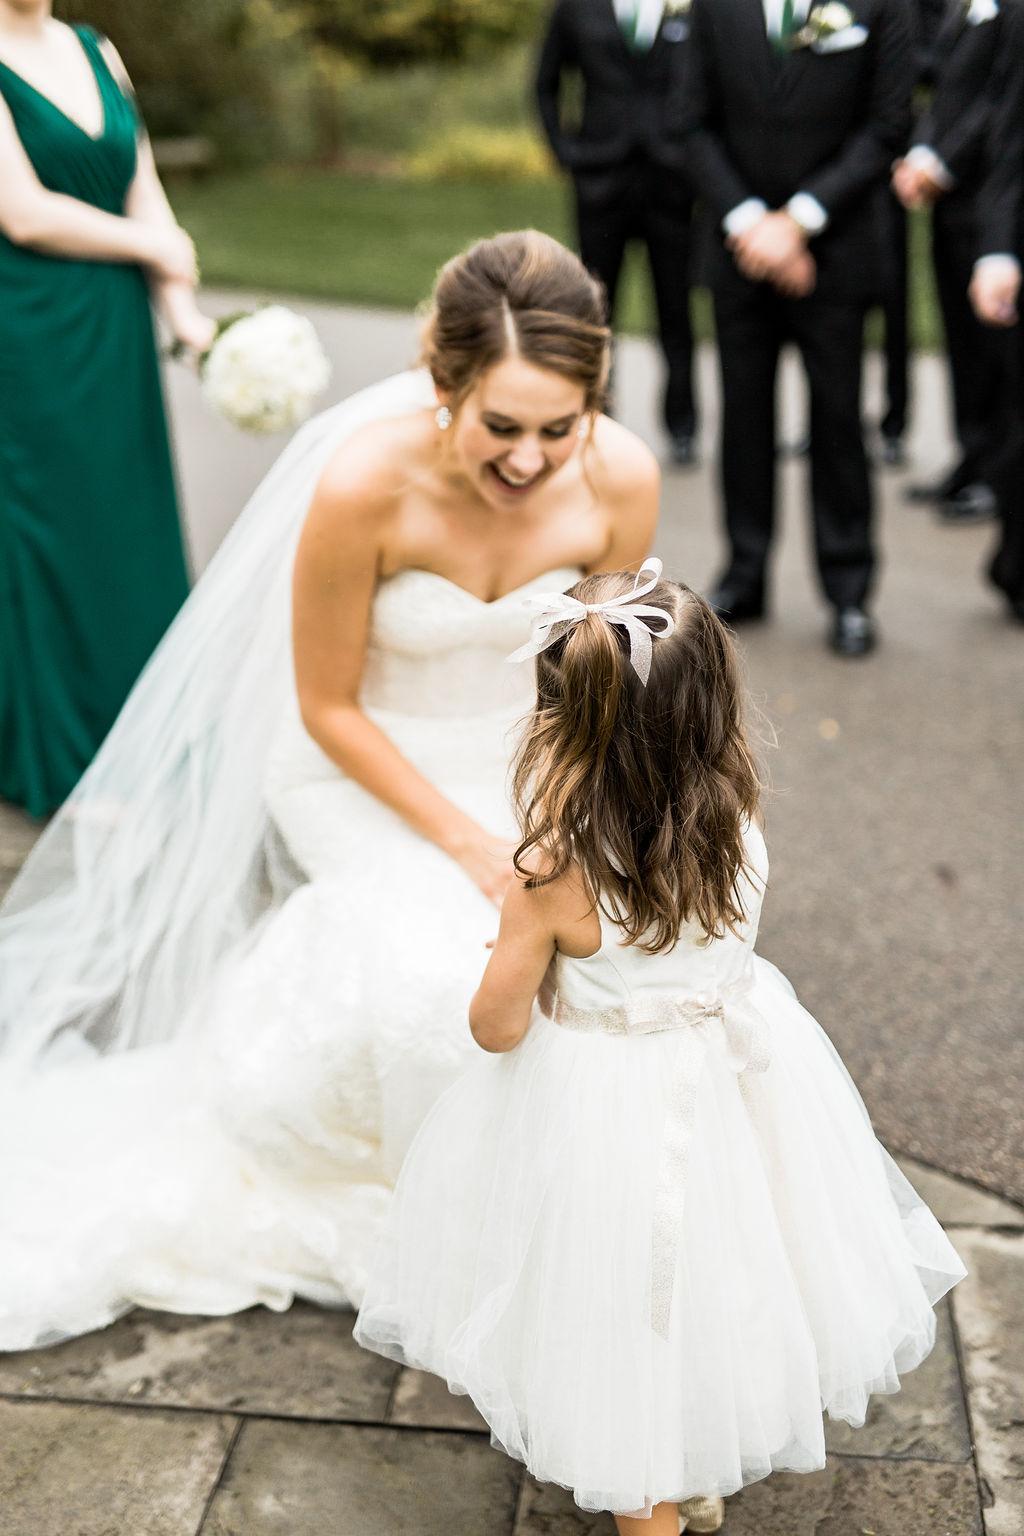 best_midwest_wedding_photographer_JMH_photography-41.jpg